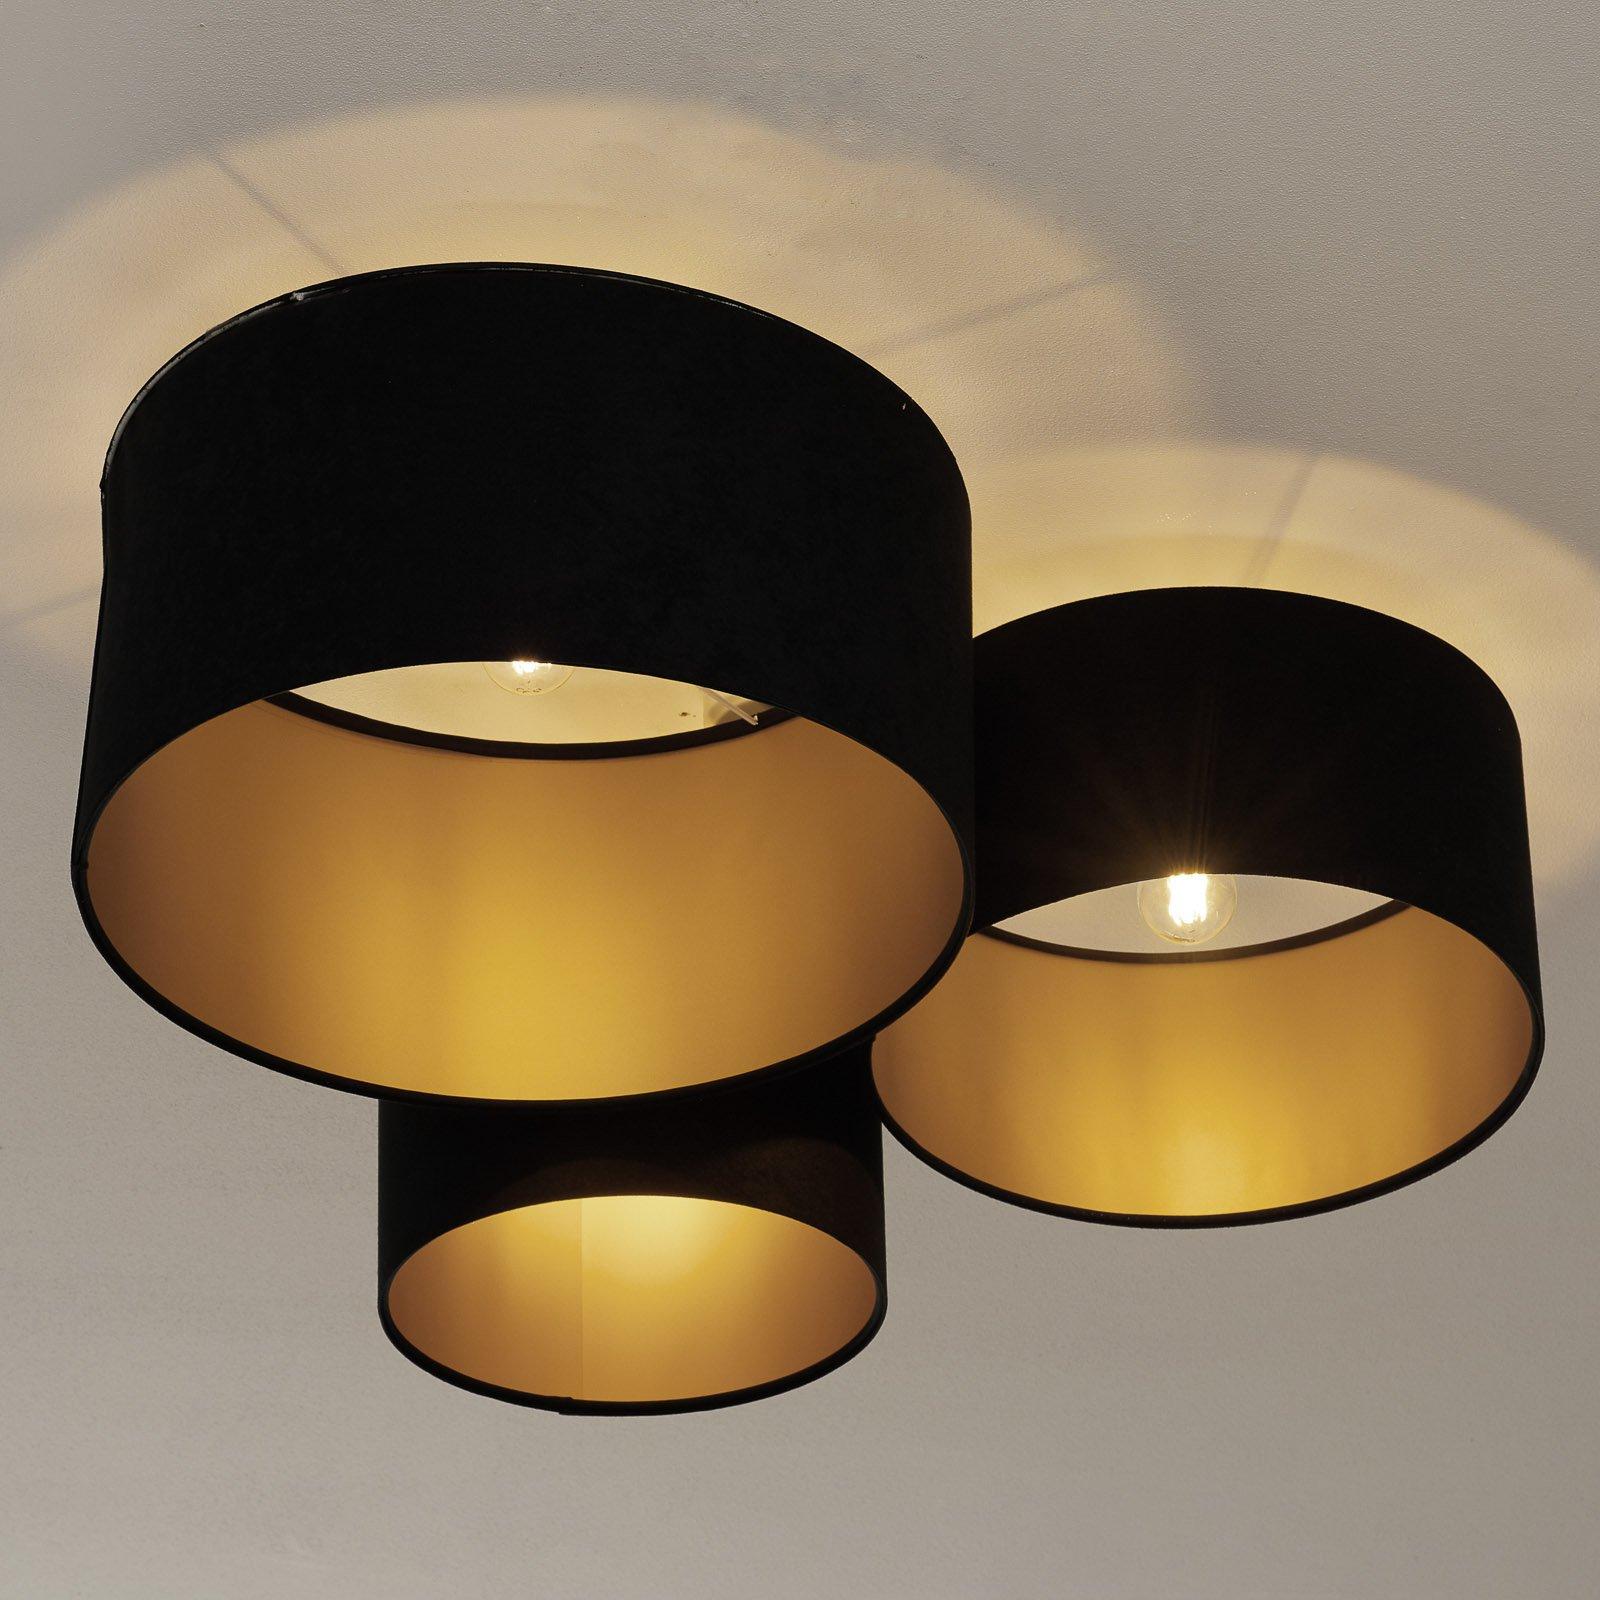 Taklampe 080, tre lyskilder, svart-gull